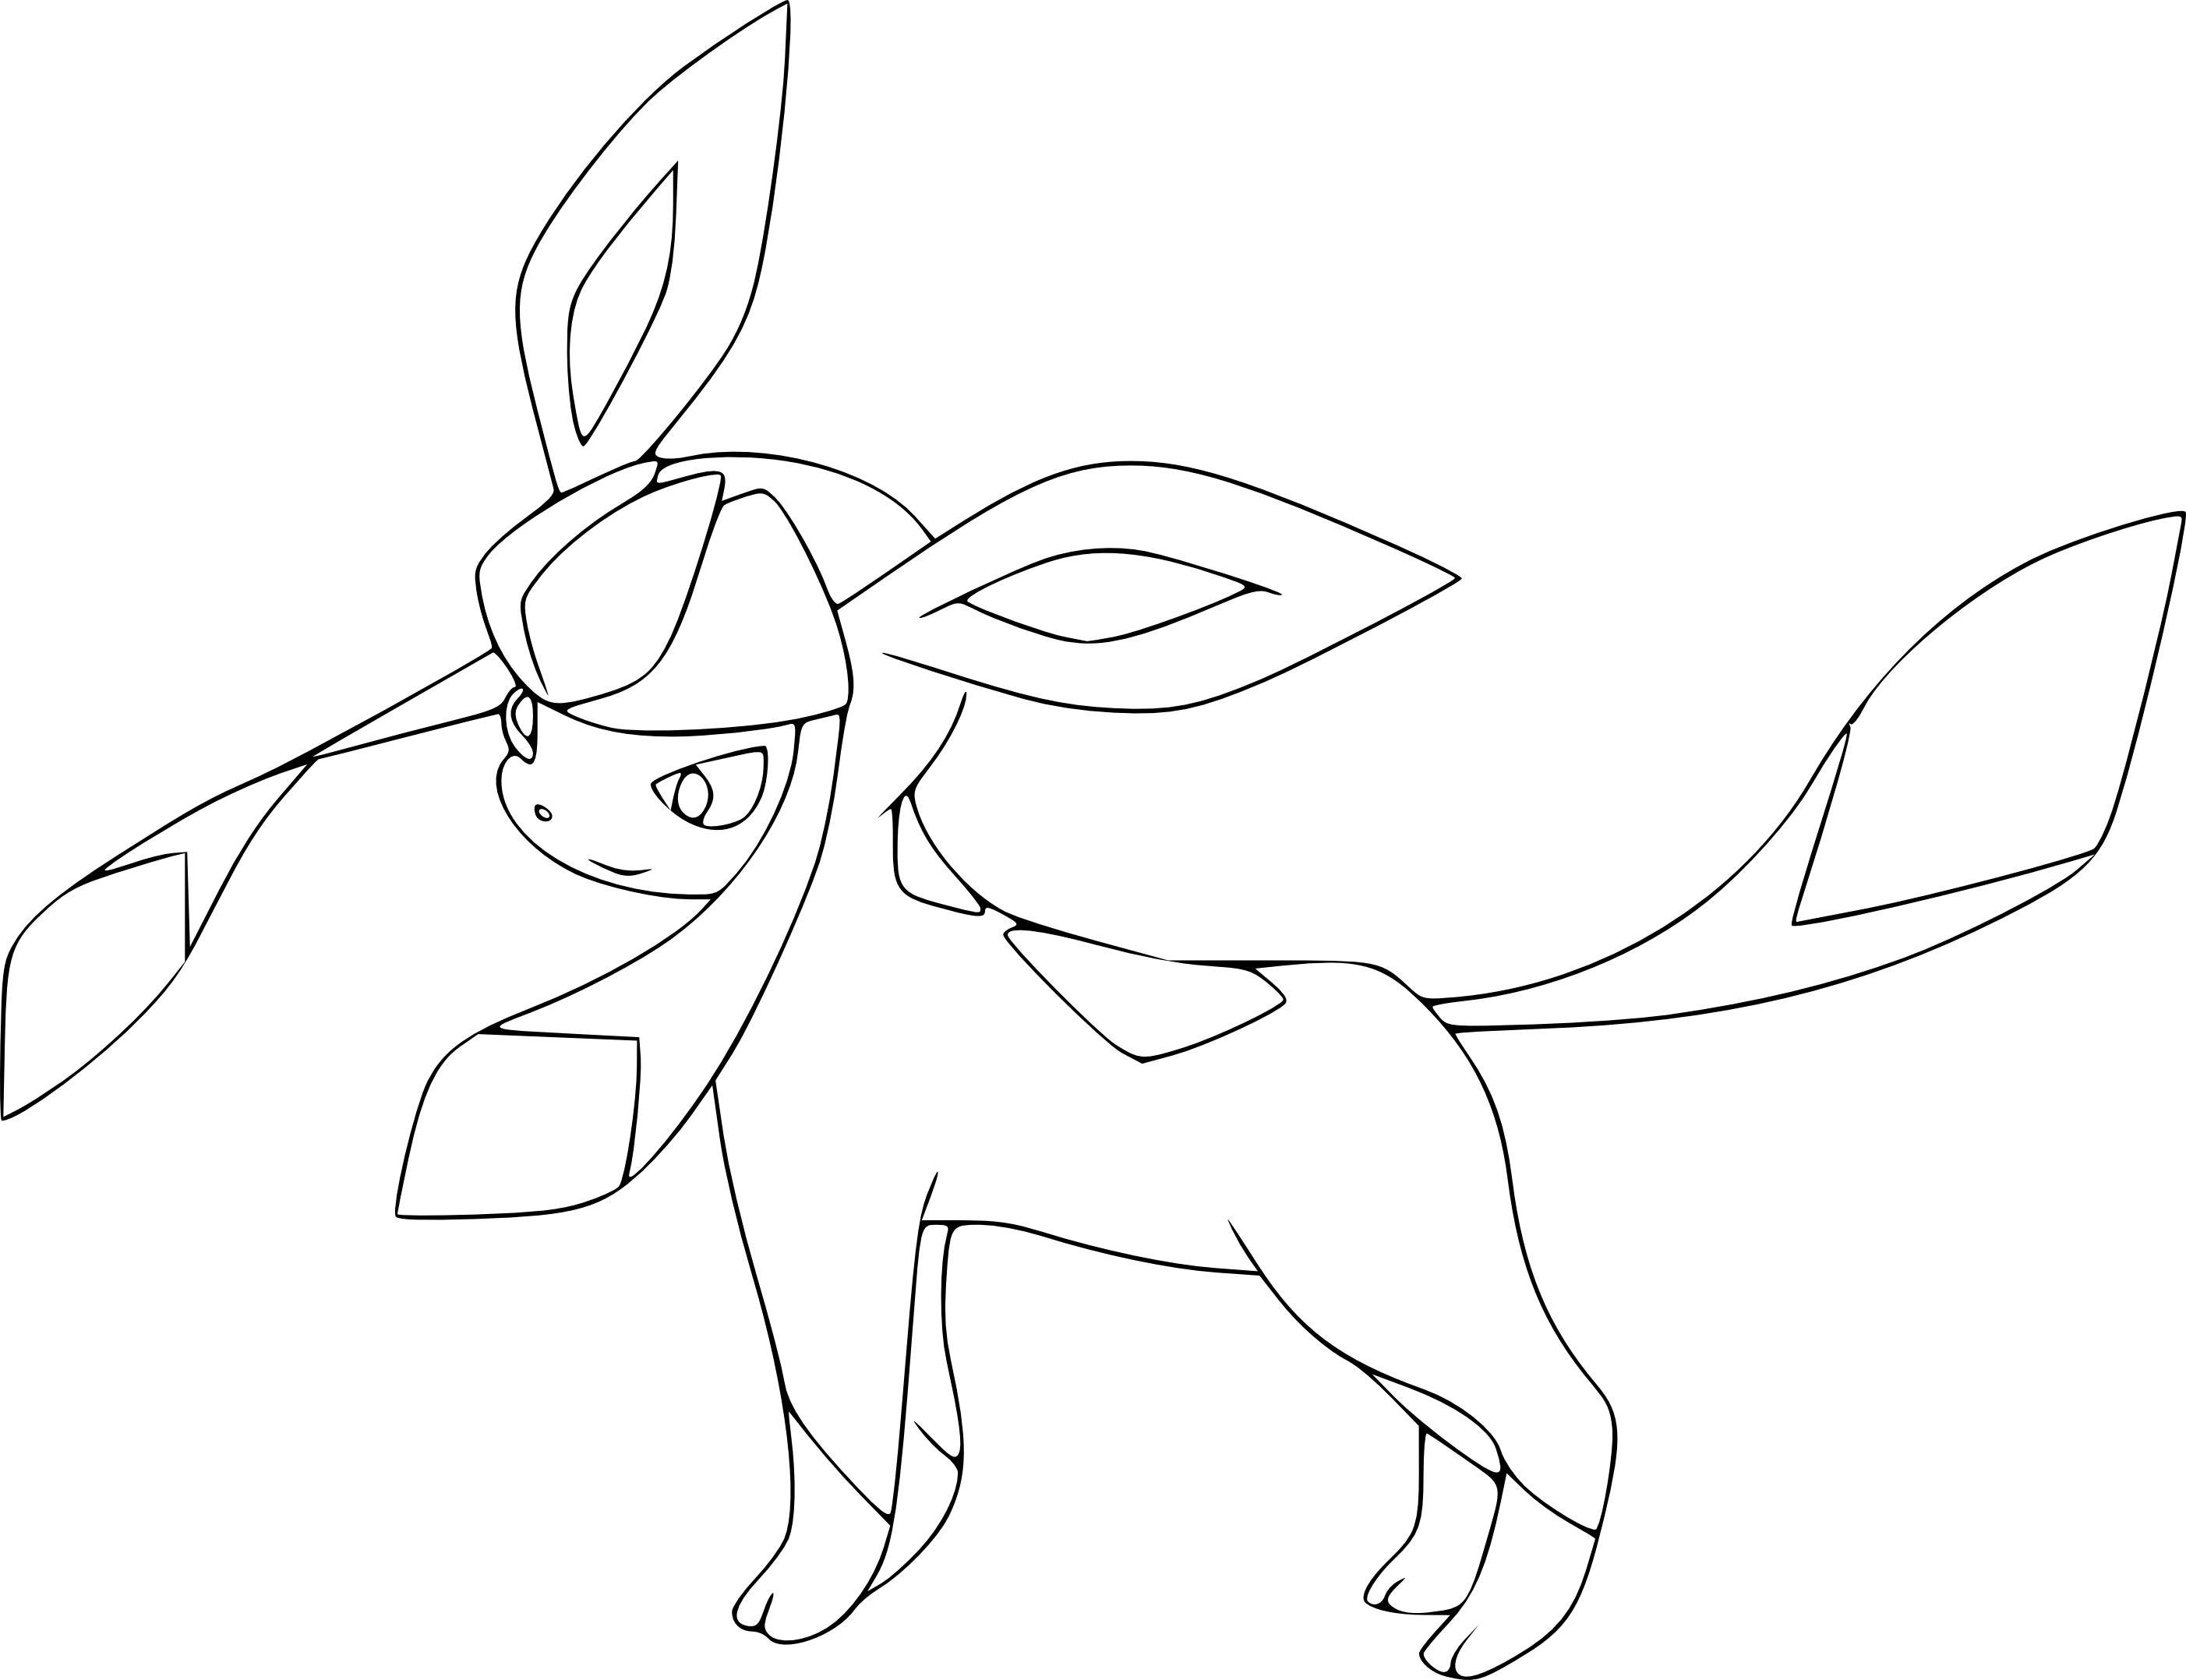 Beau dessin a imprimer pokemon voltali - Image pokemon a imprimer ...